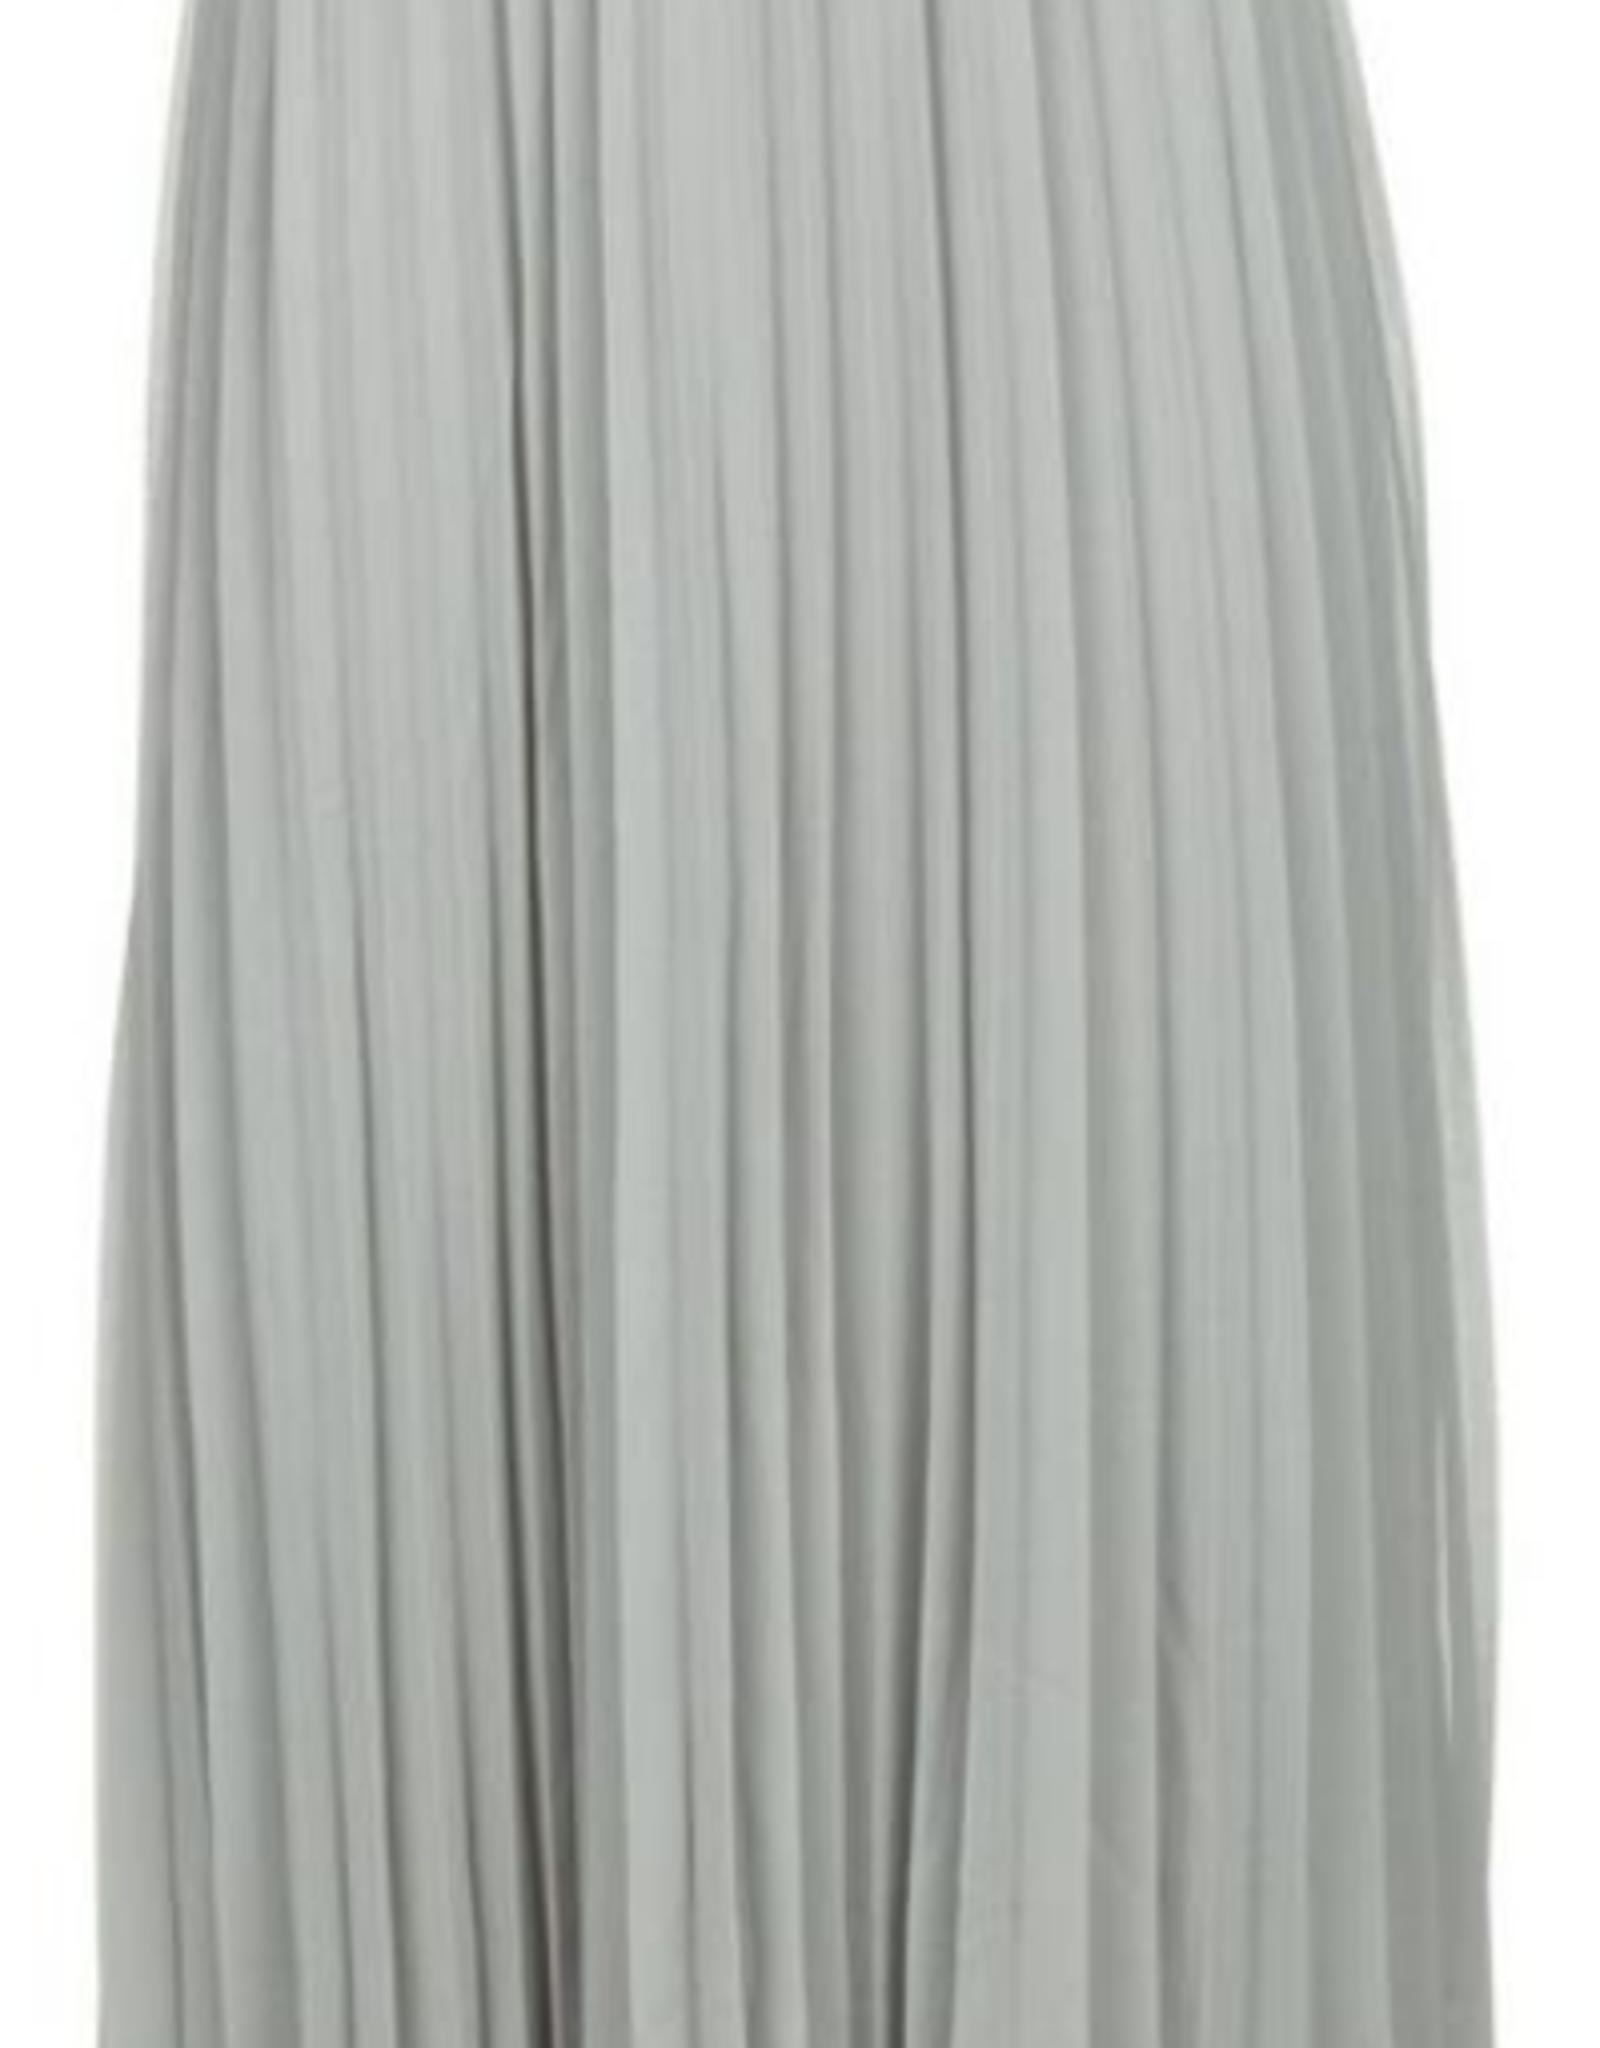 JcSophie Rok Deloris Light Grey